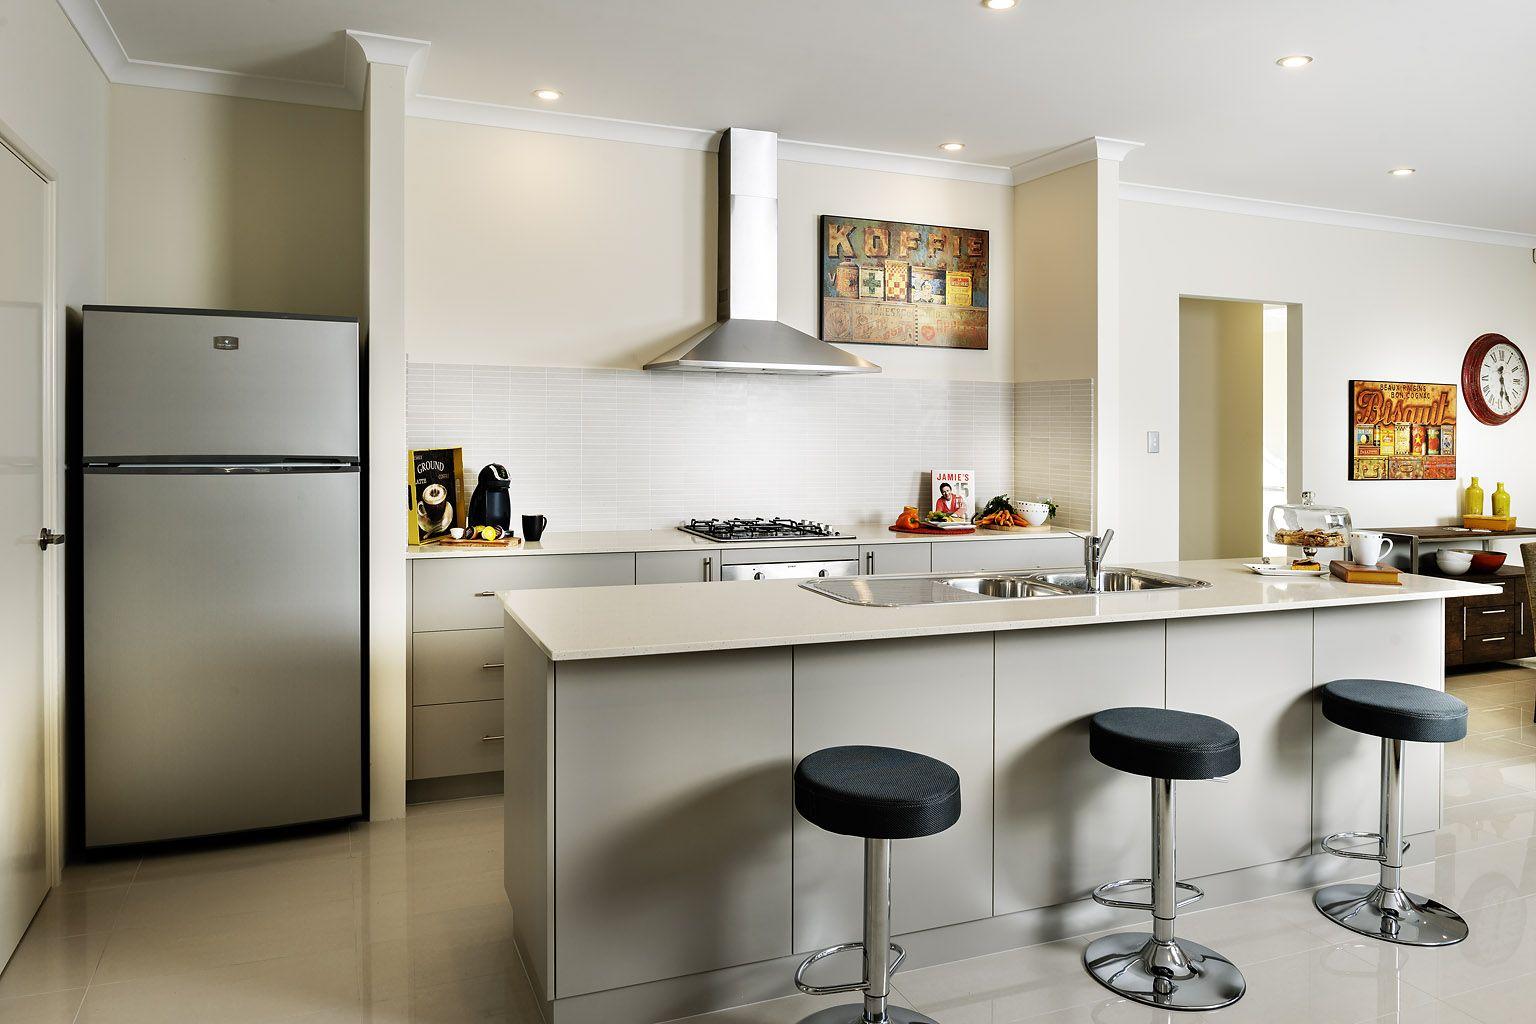 Kitchen - Aspire Display Home - Homebuyers Centre - Aveley, WA ...